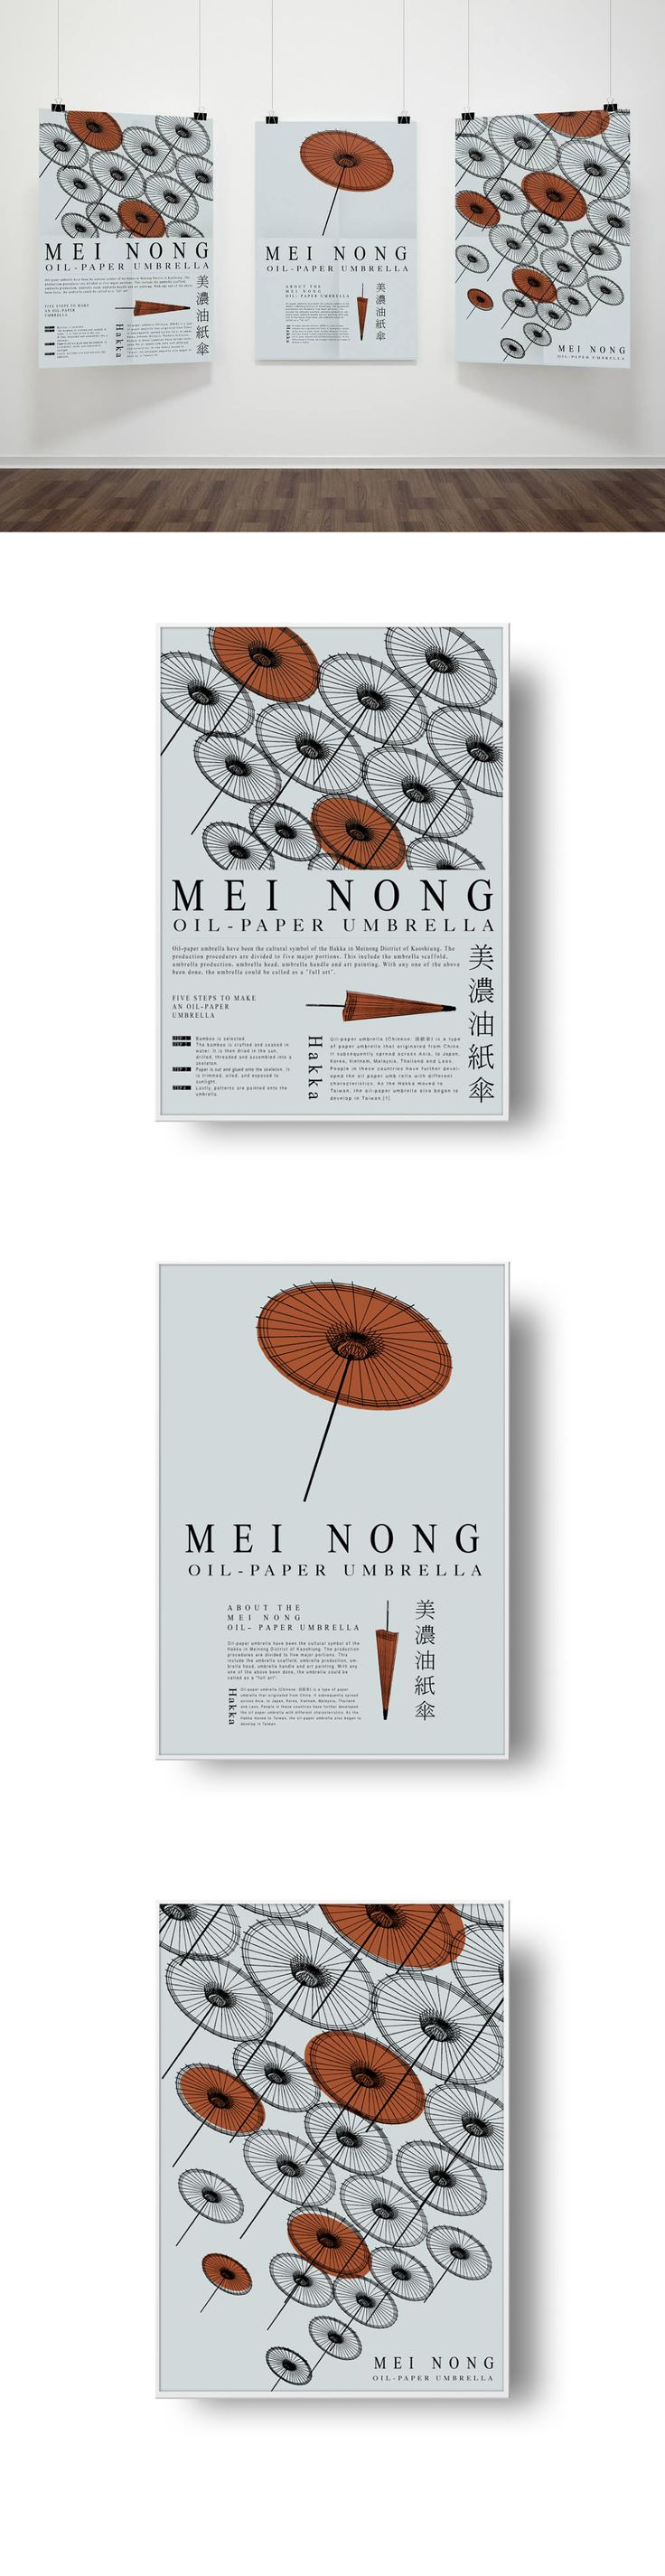 【 Transform Design 瑜悅分享 】美濃油紙傘 文宣設計 - 李宜軒,台灣視覺設計師  http://www.yihsuanli.com/Oil-paper-umbrella